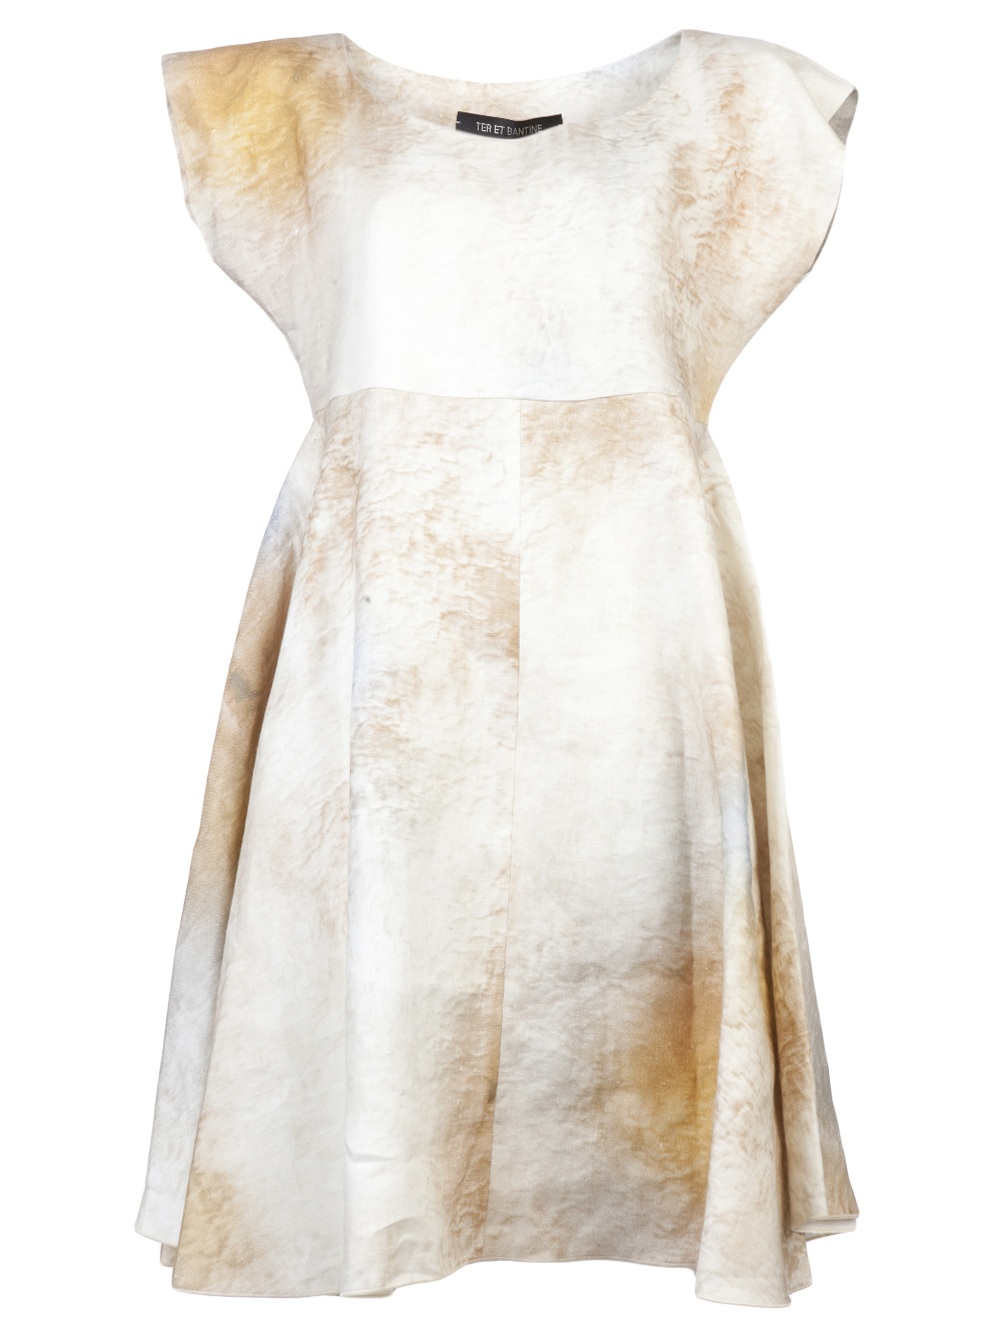 Ter Et Bantine women's Stained dress | Dawoob Women